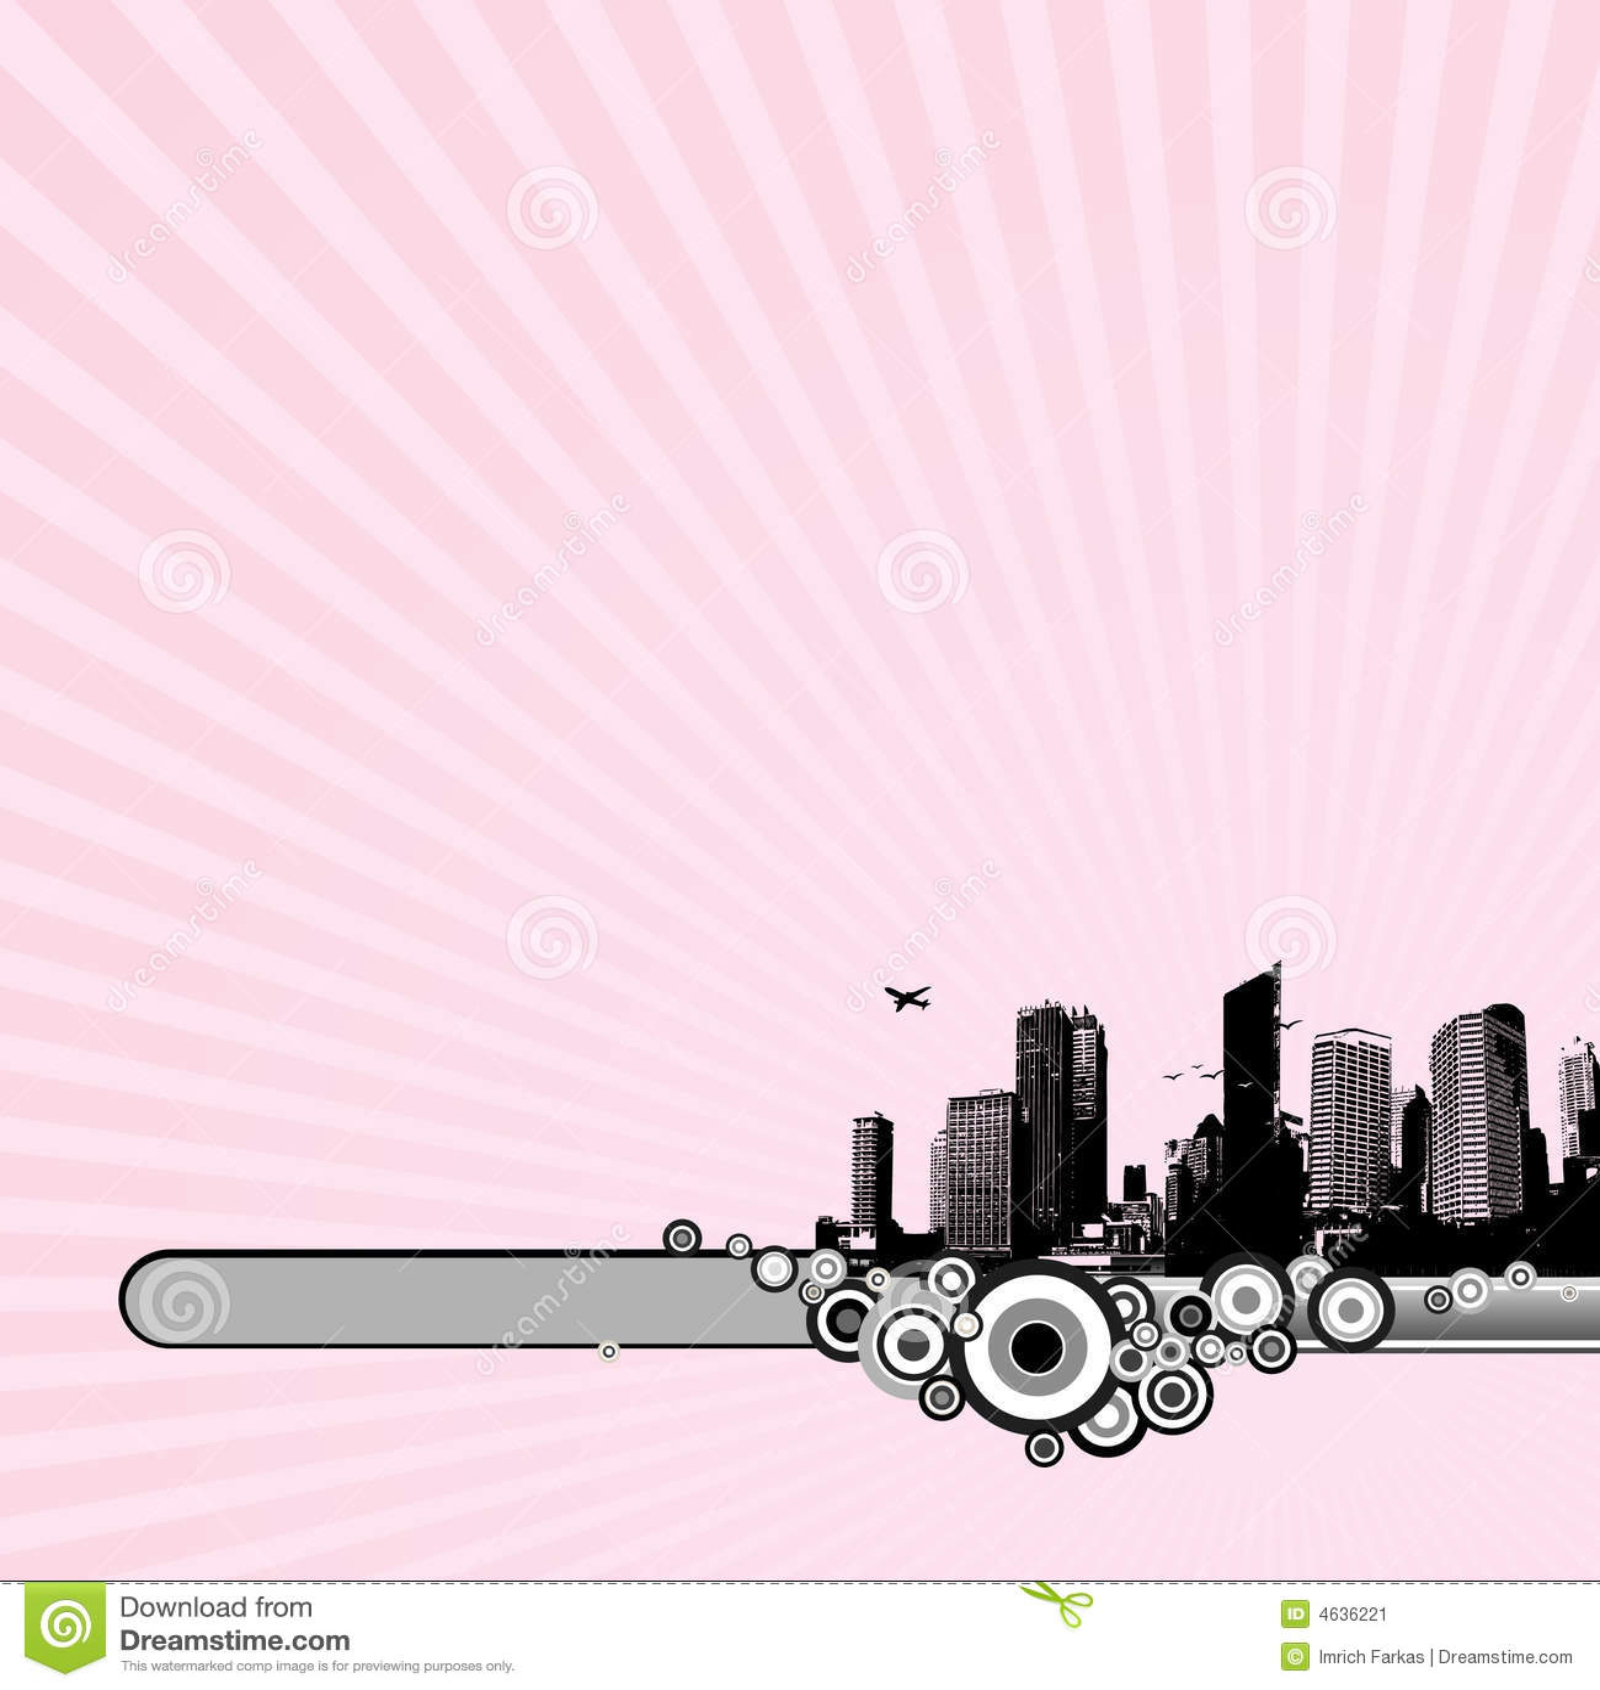 Cidade preta no fundo cor-de-rosa.